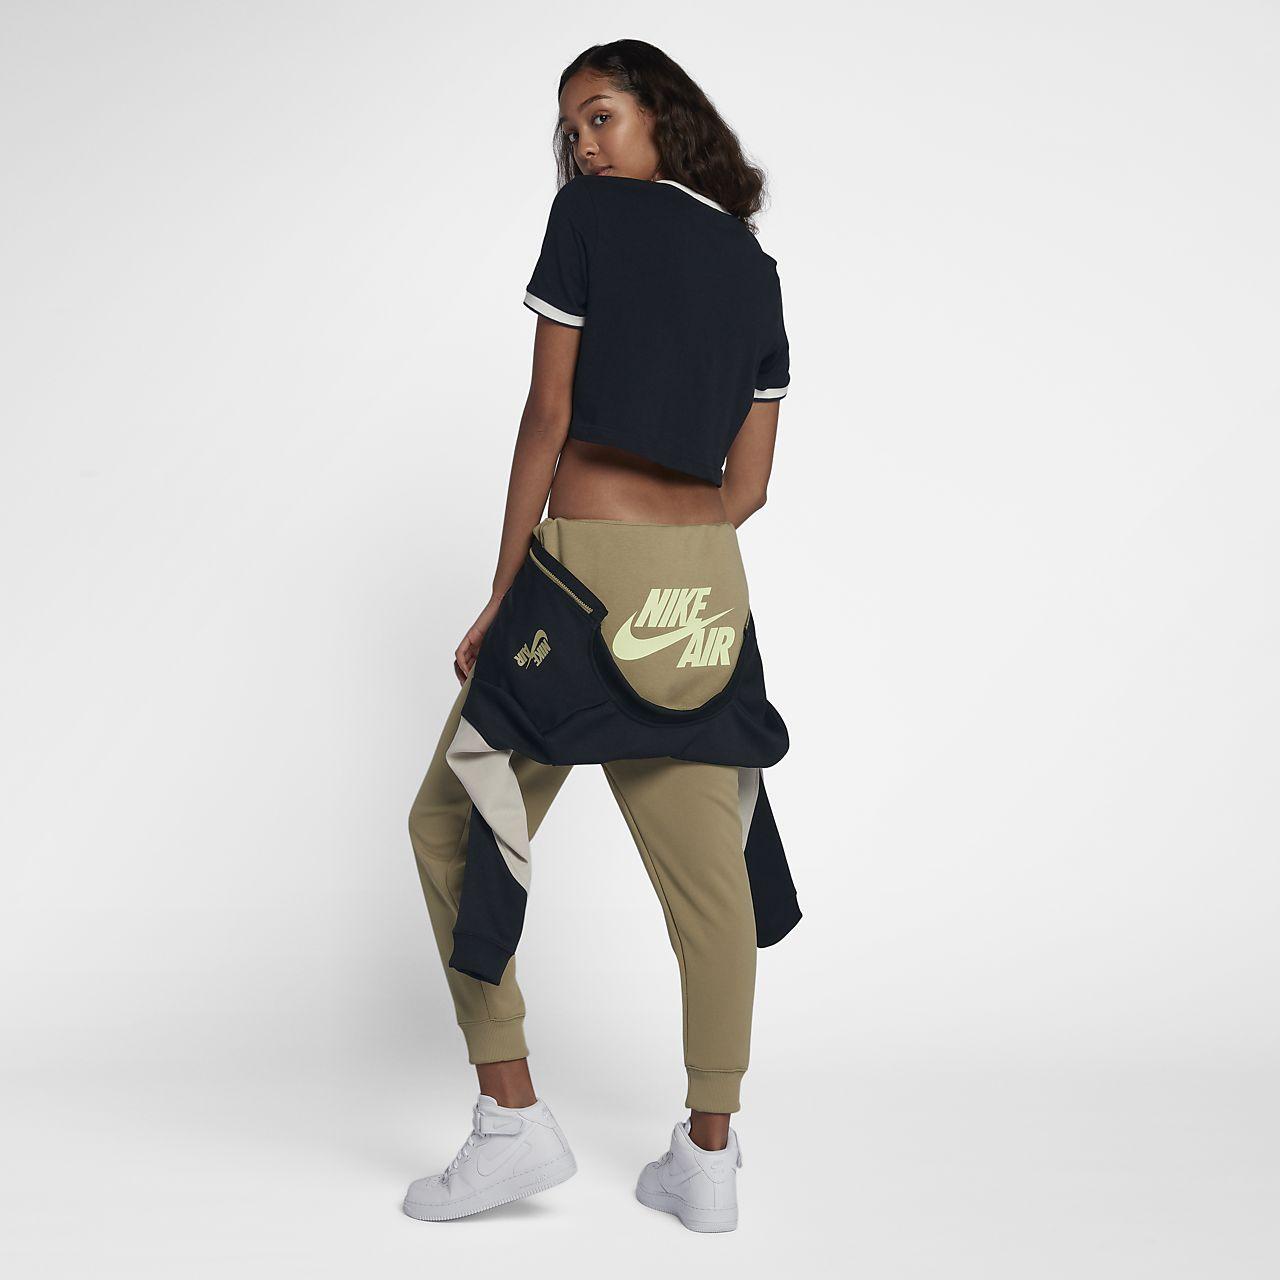 3f21e720f313 Nike Air Women s Jumpsuit